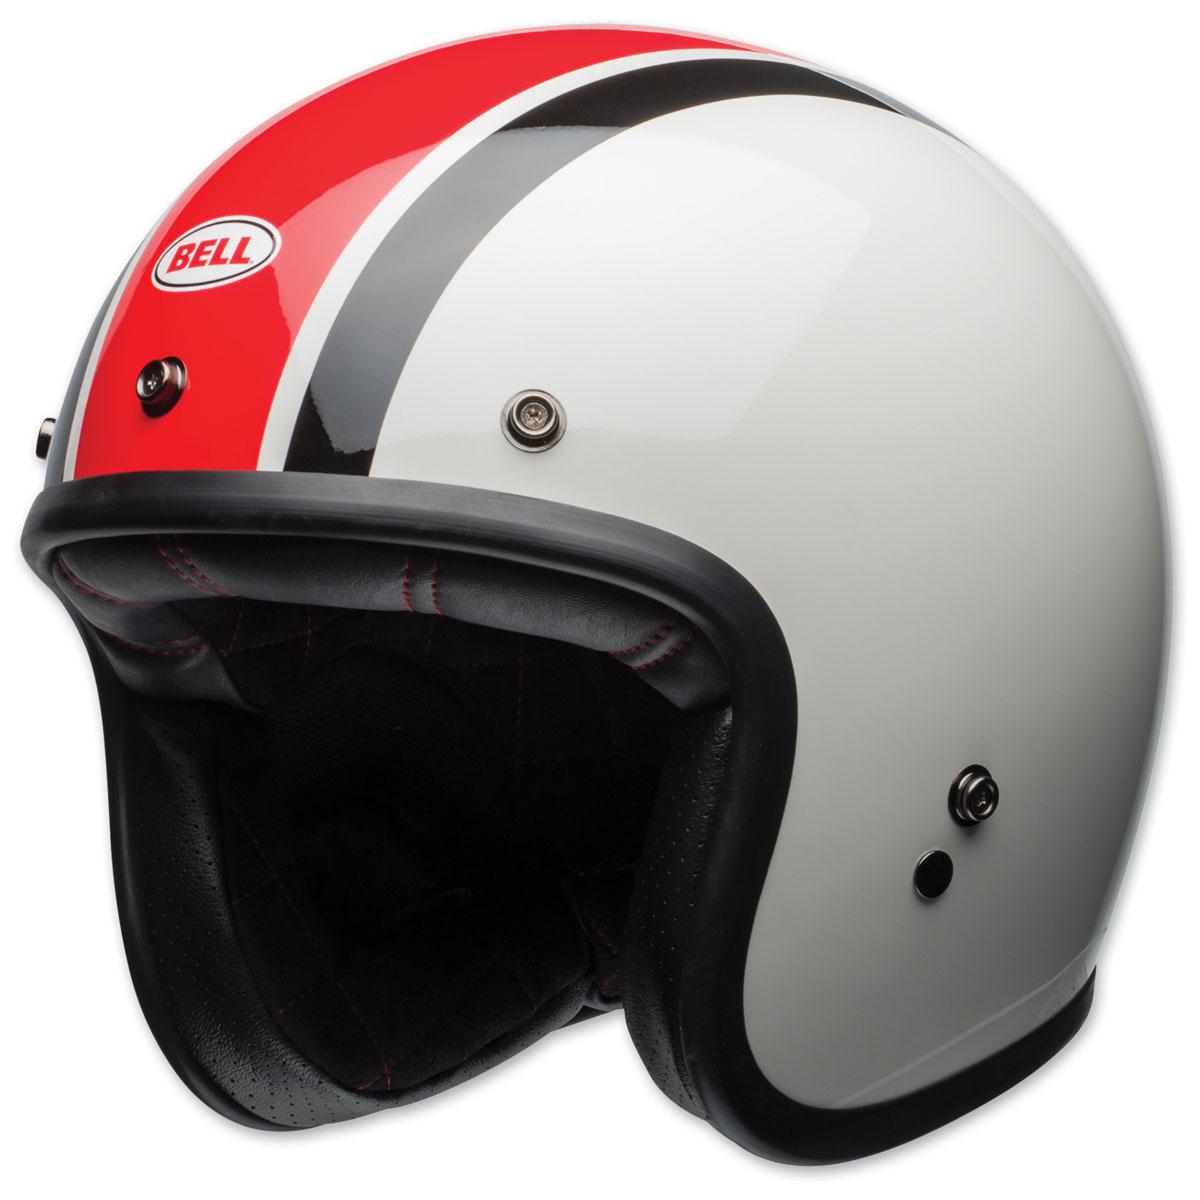 Bell Custom 500 LE Ace Cafe Stadium Open Face Helmet